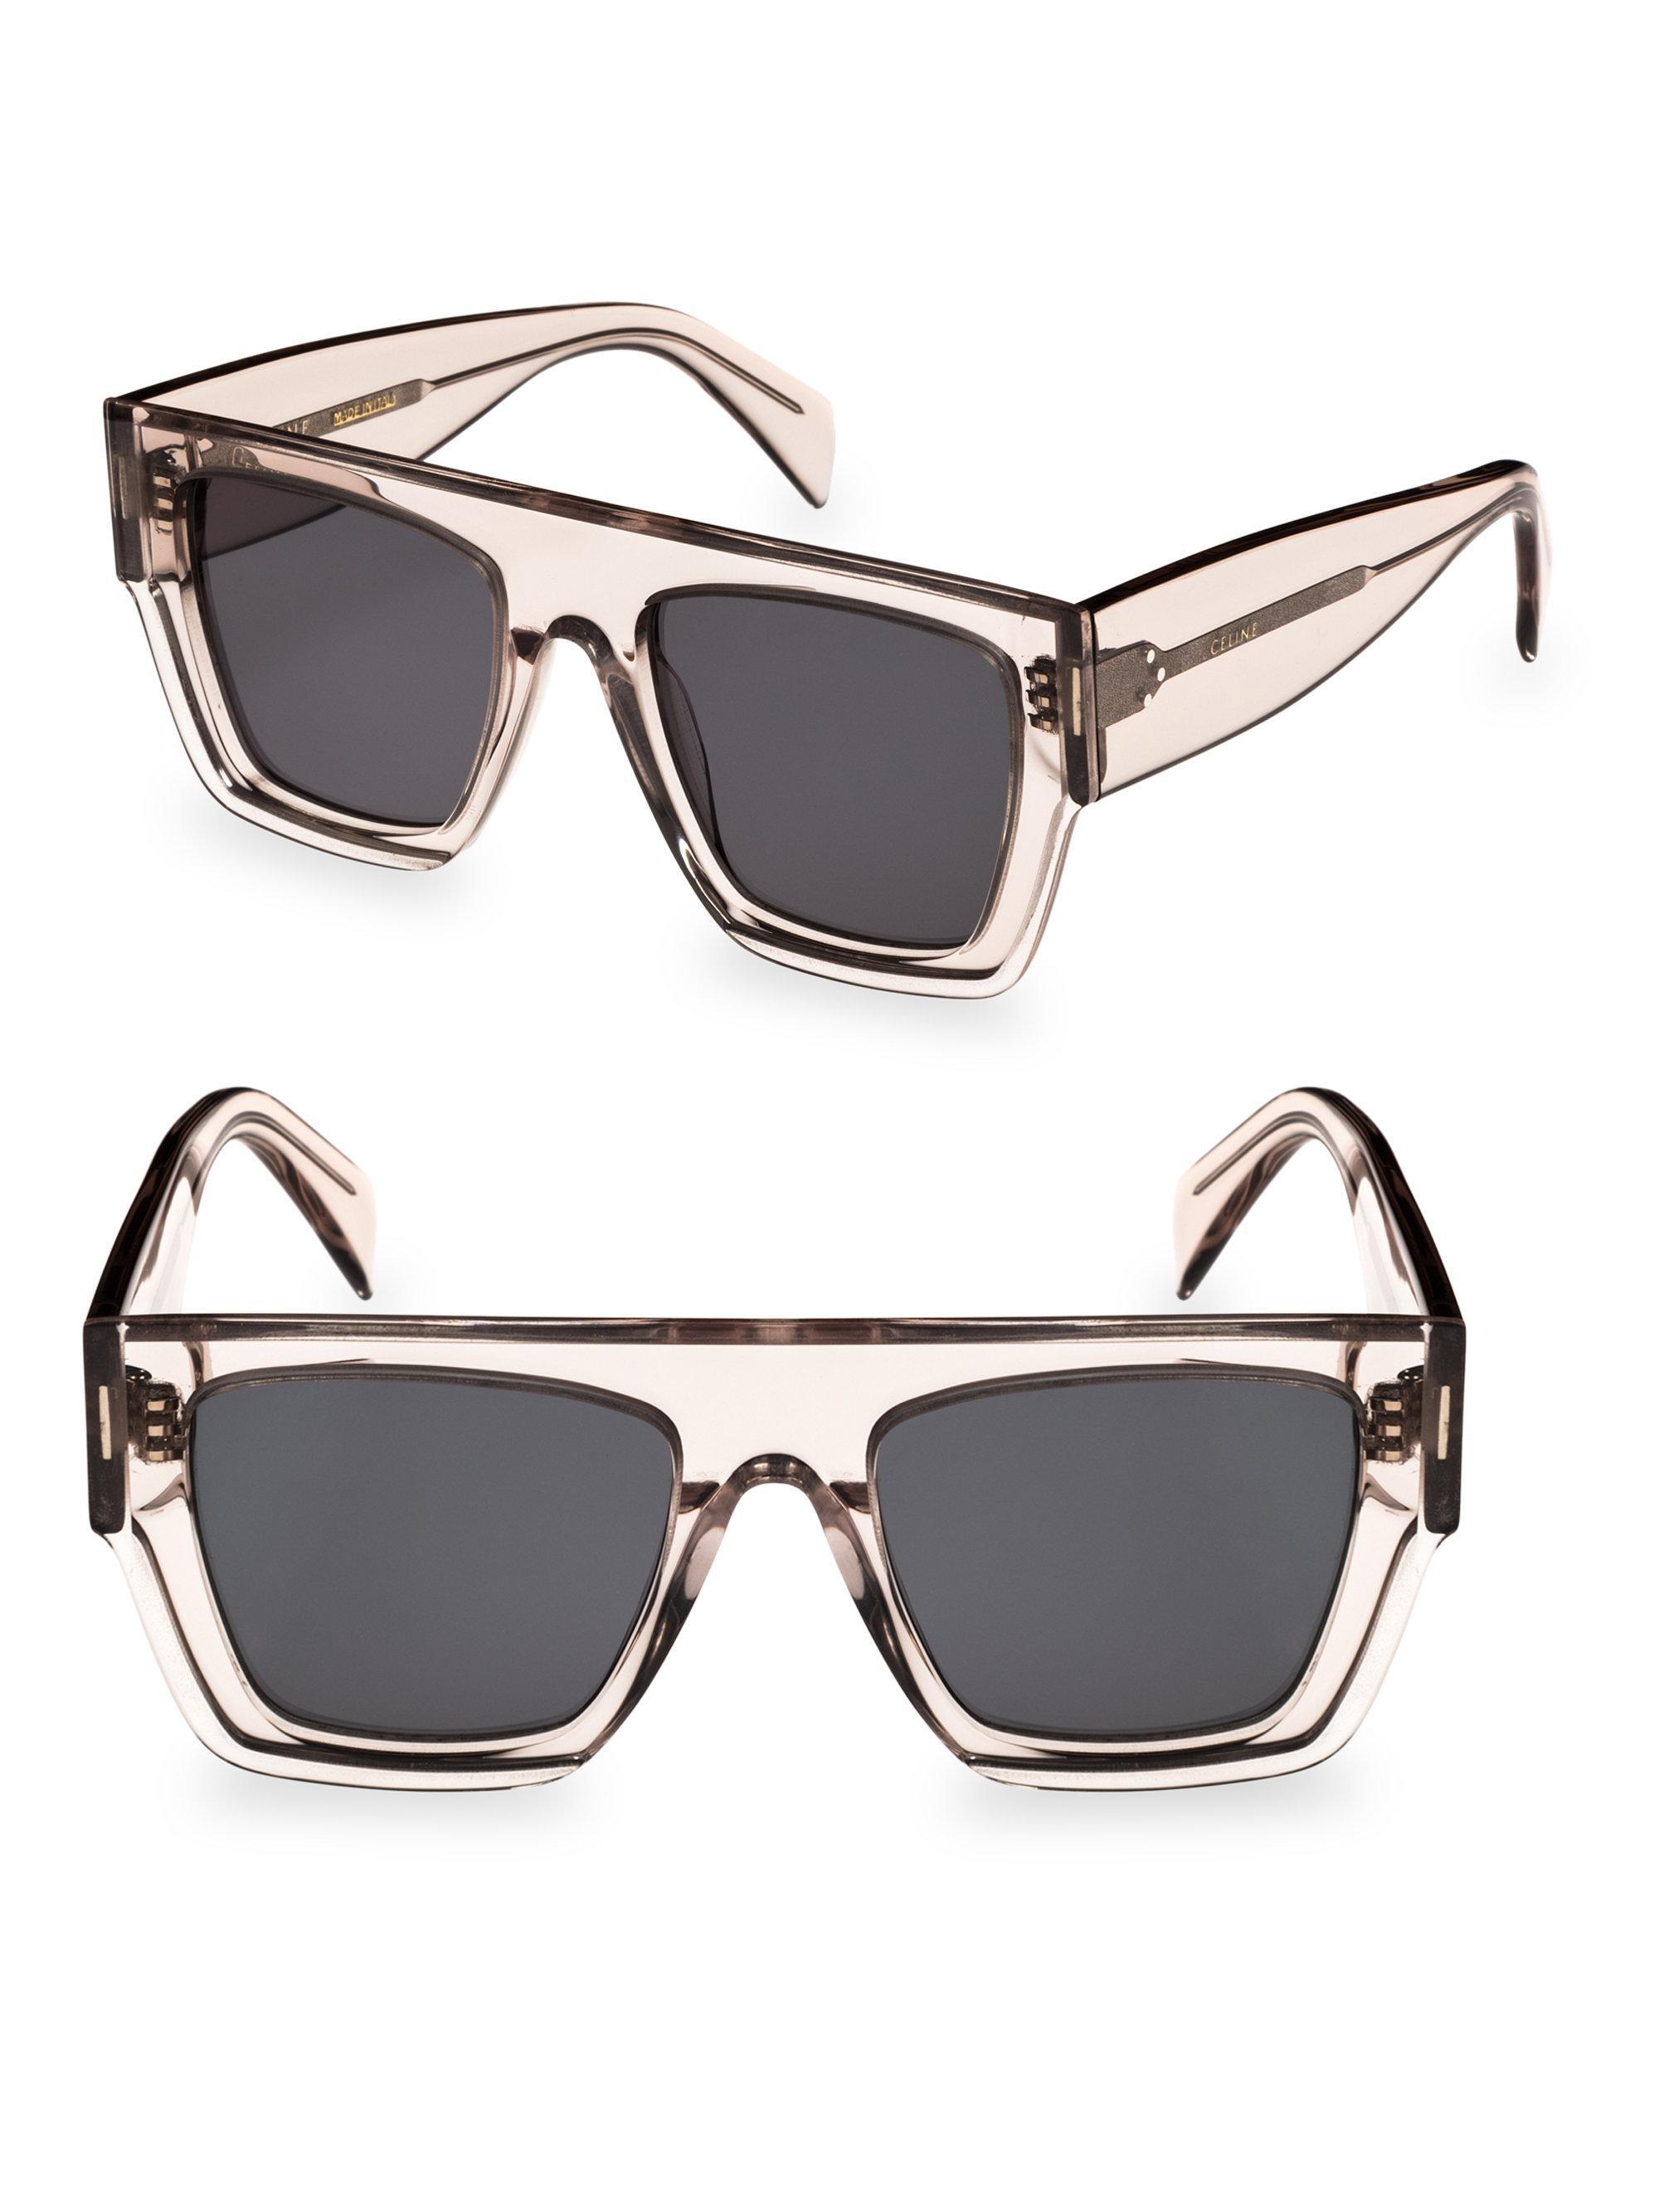 af6355b7fa33 Céline C?line 51mm Rectangular Sunglasses in Pink - Lyst